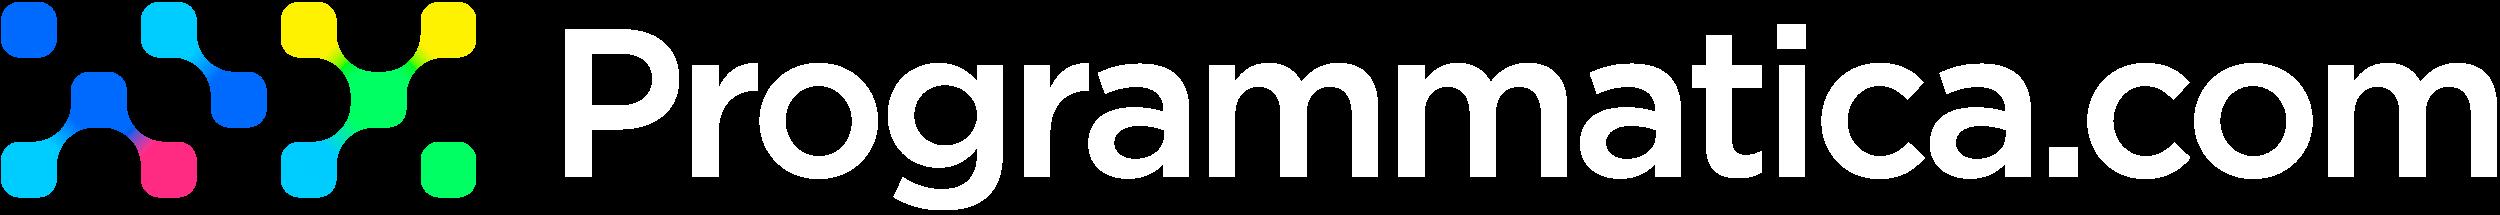 Programmatica.com